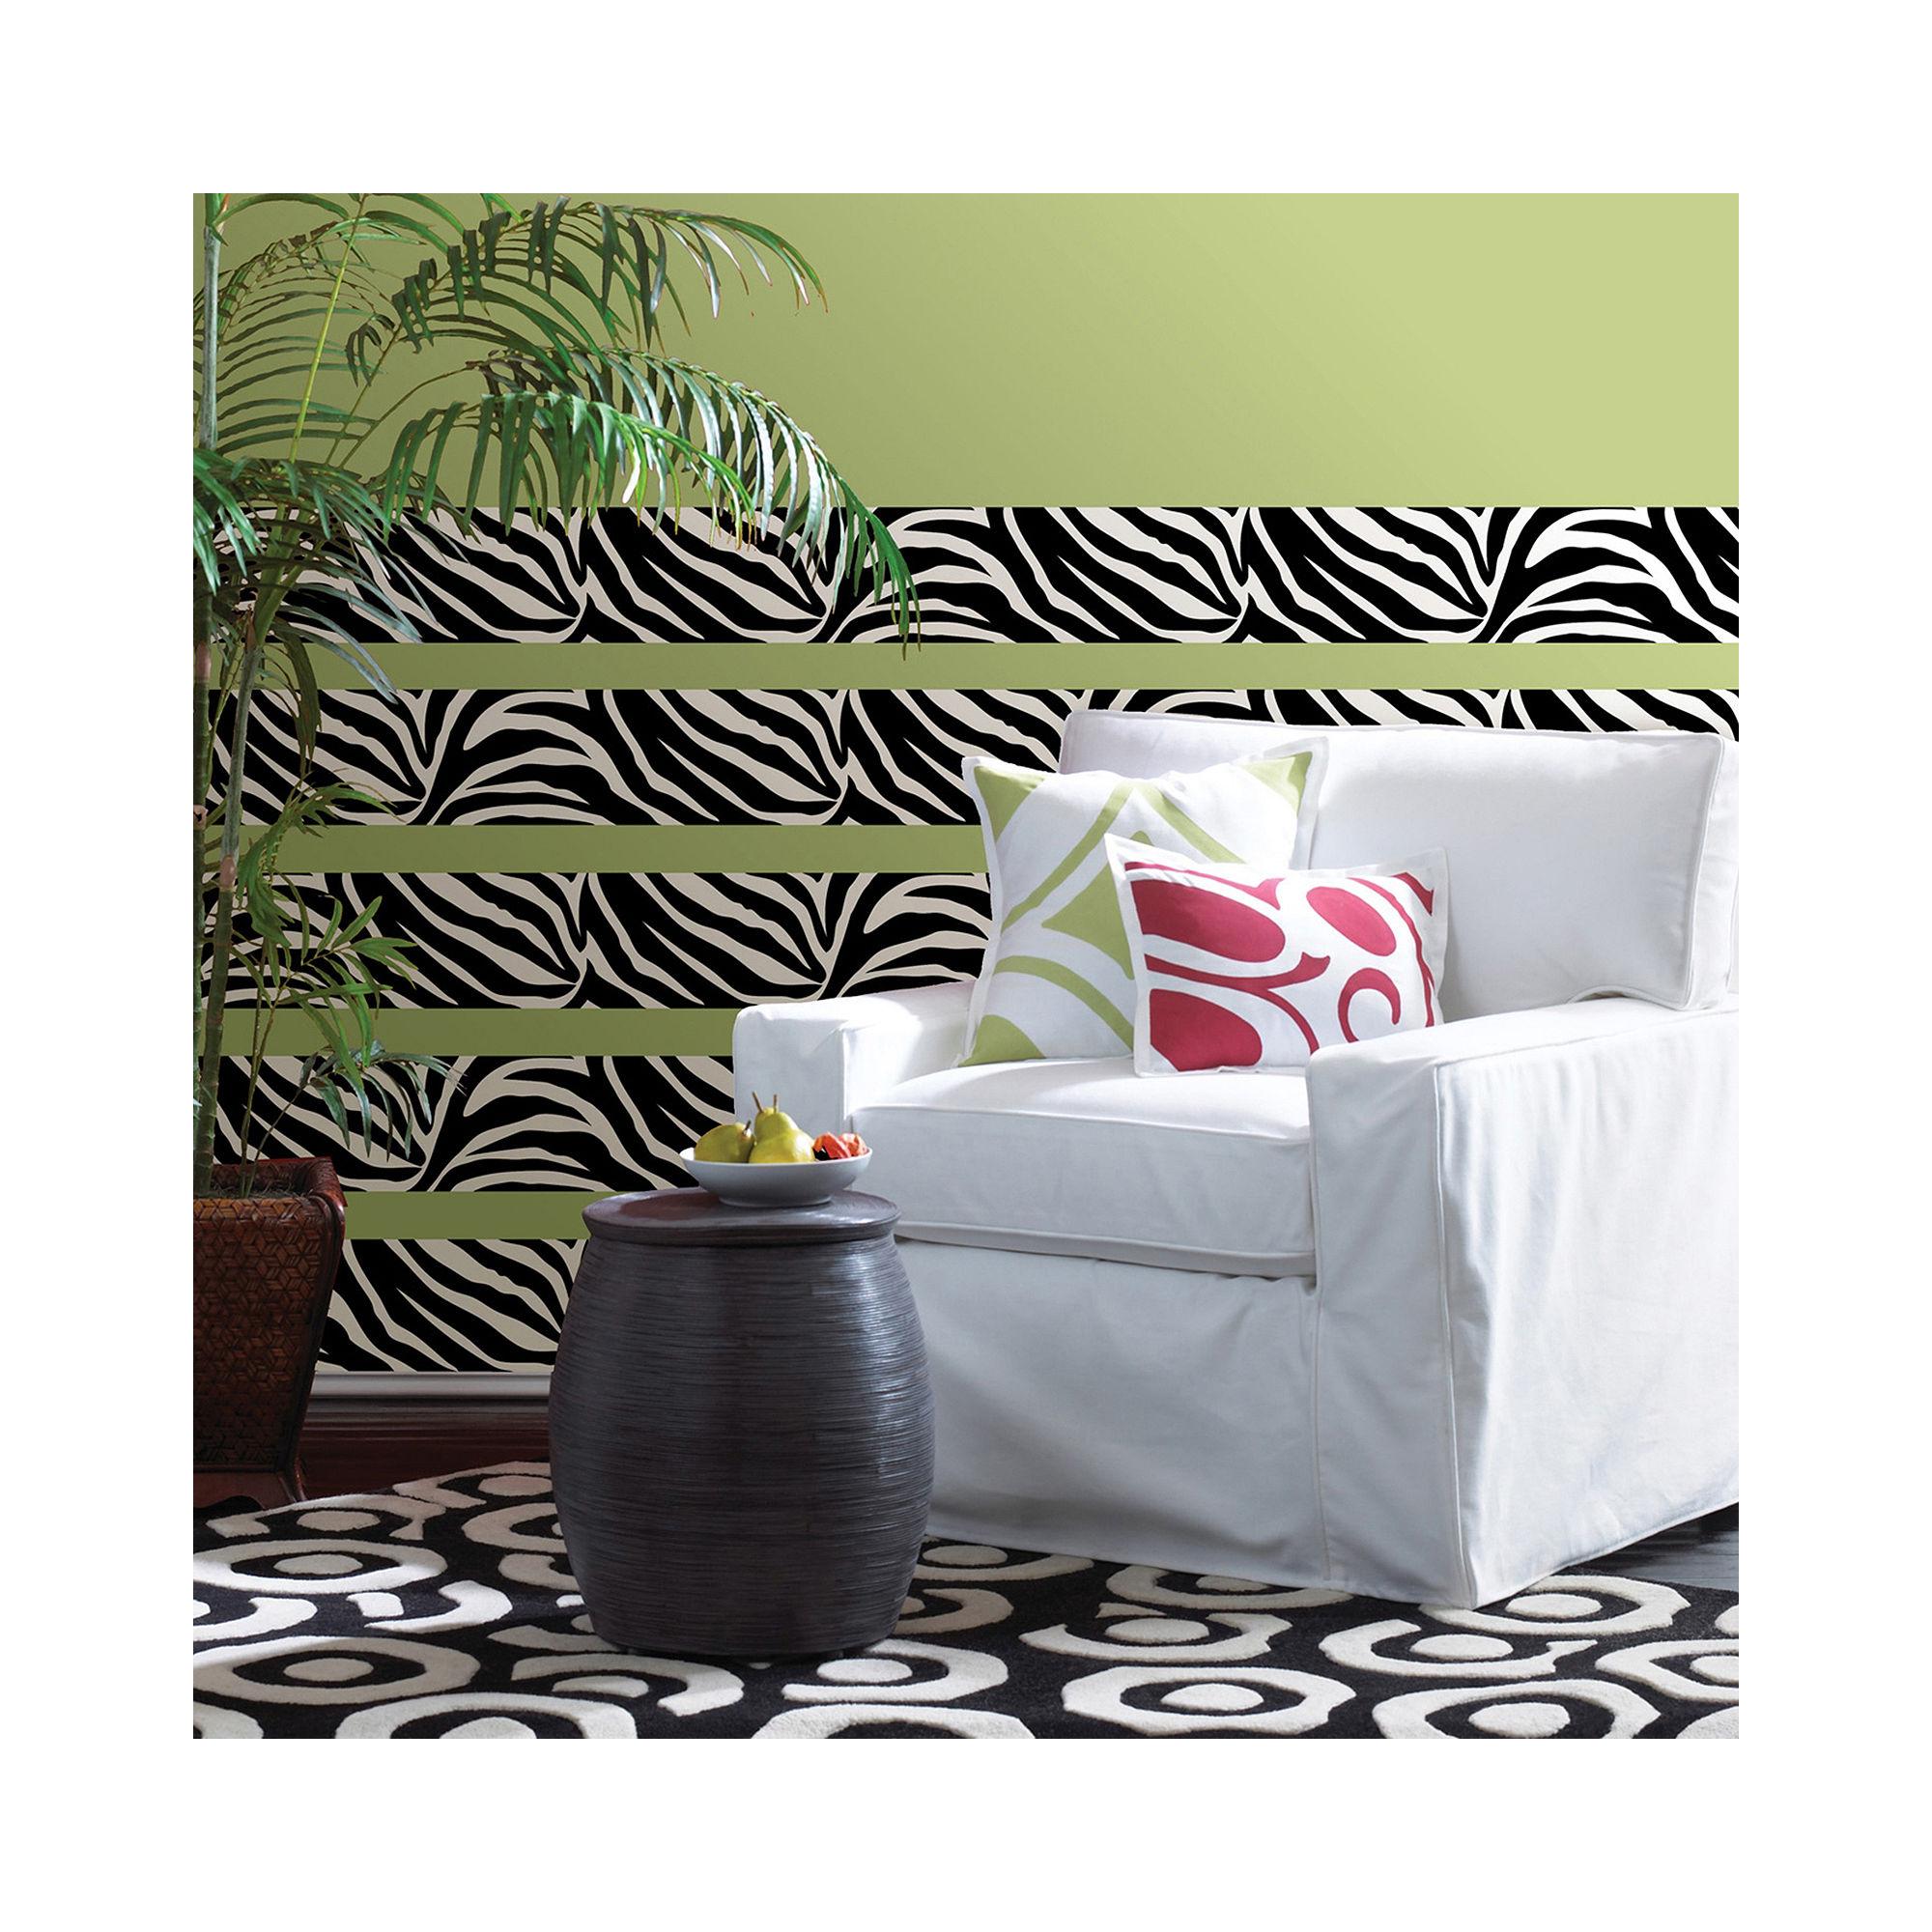 WallPops Zebra Stripe Decal